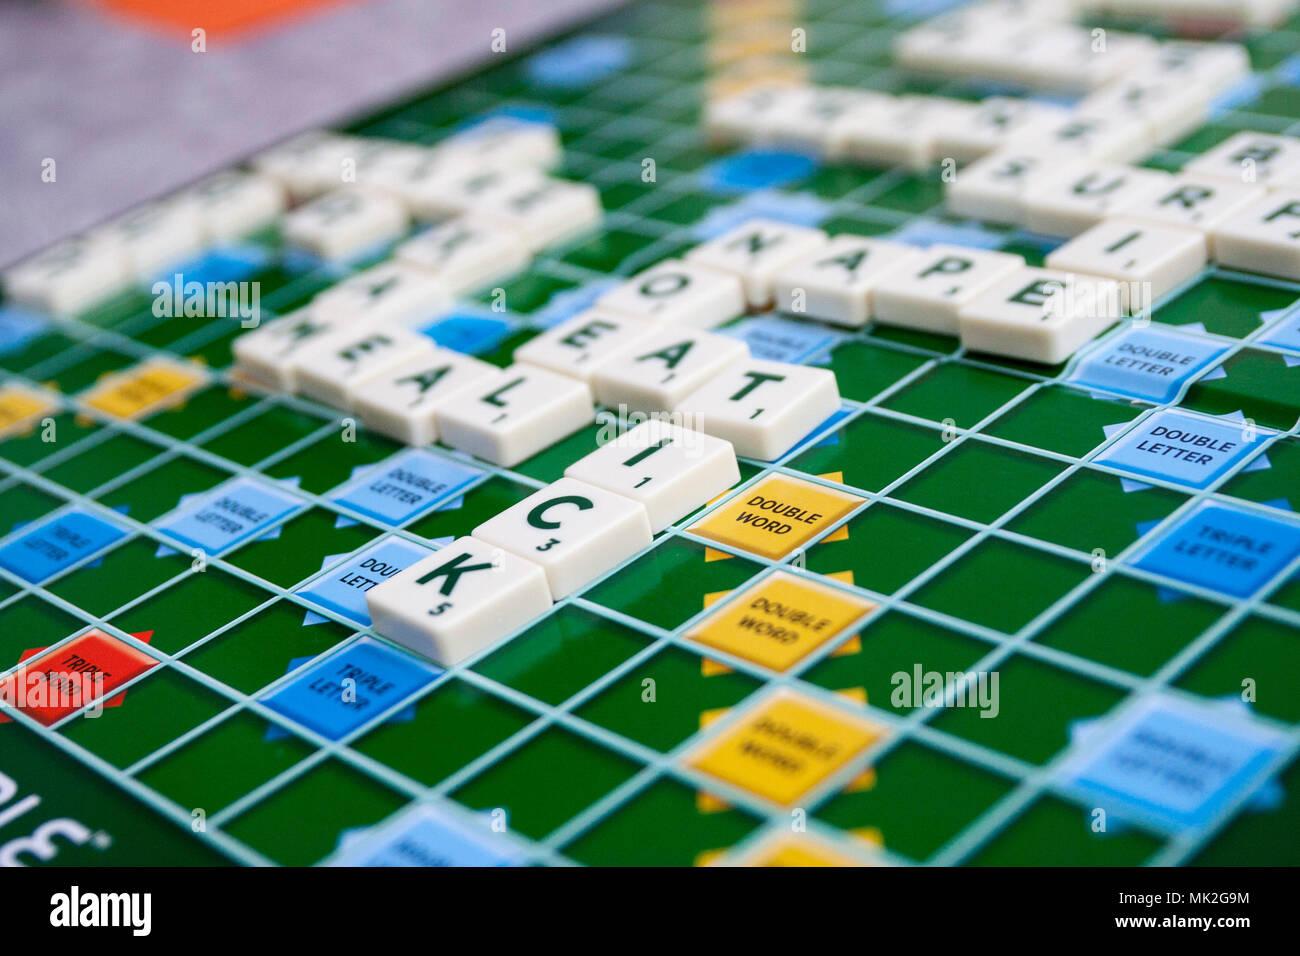 Scrabble Board Stock Photos & Scrabble Board Stock Images